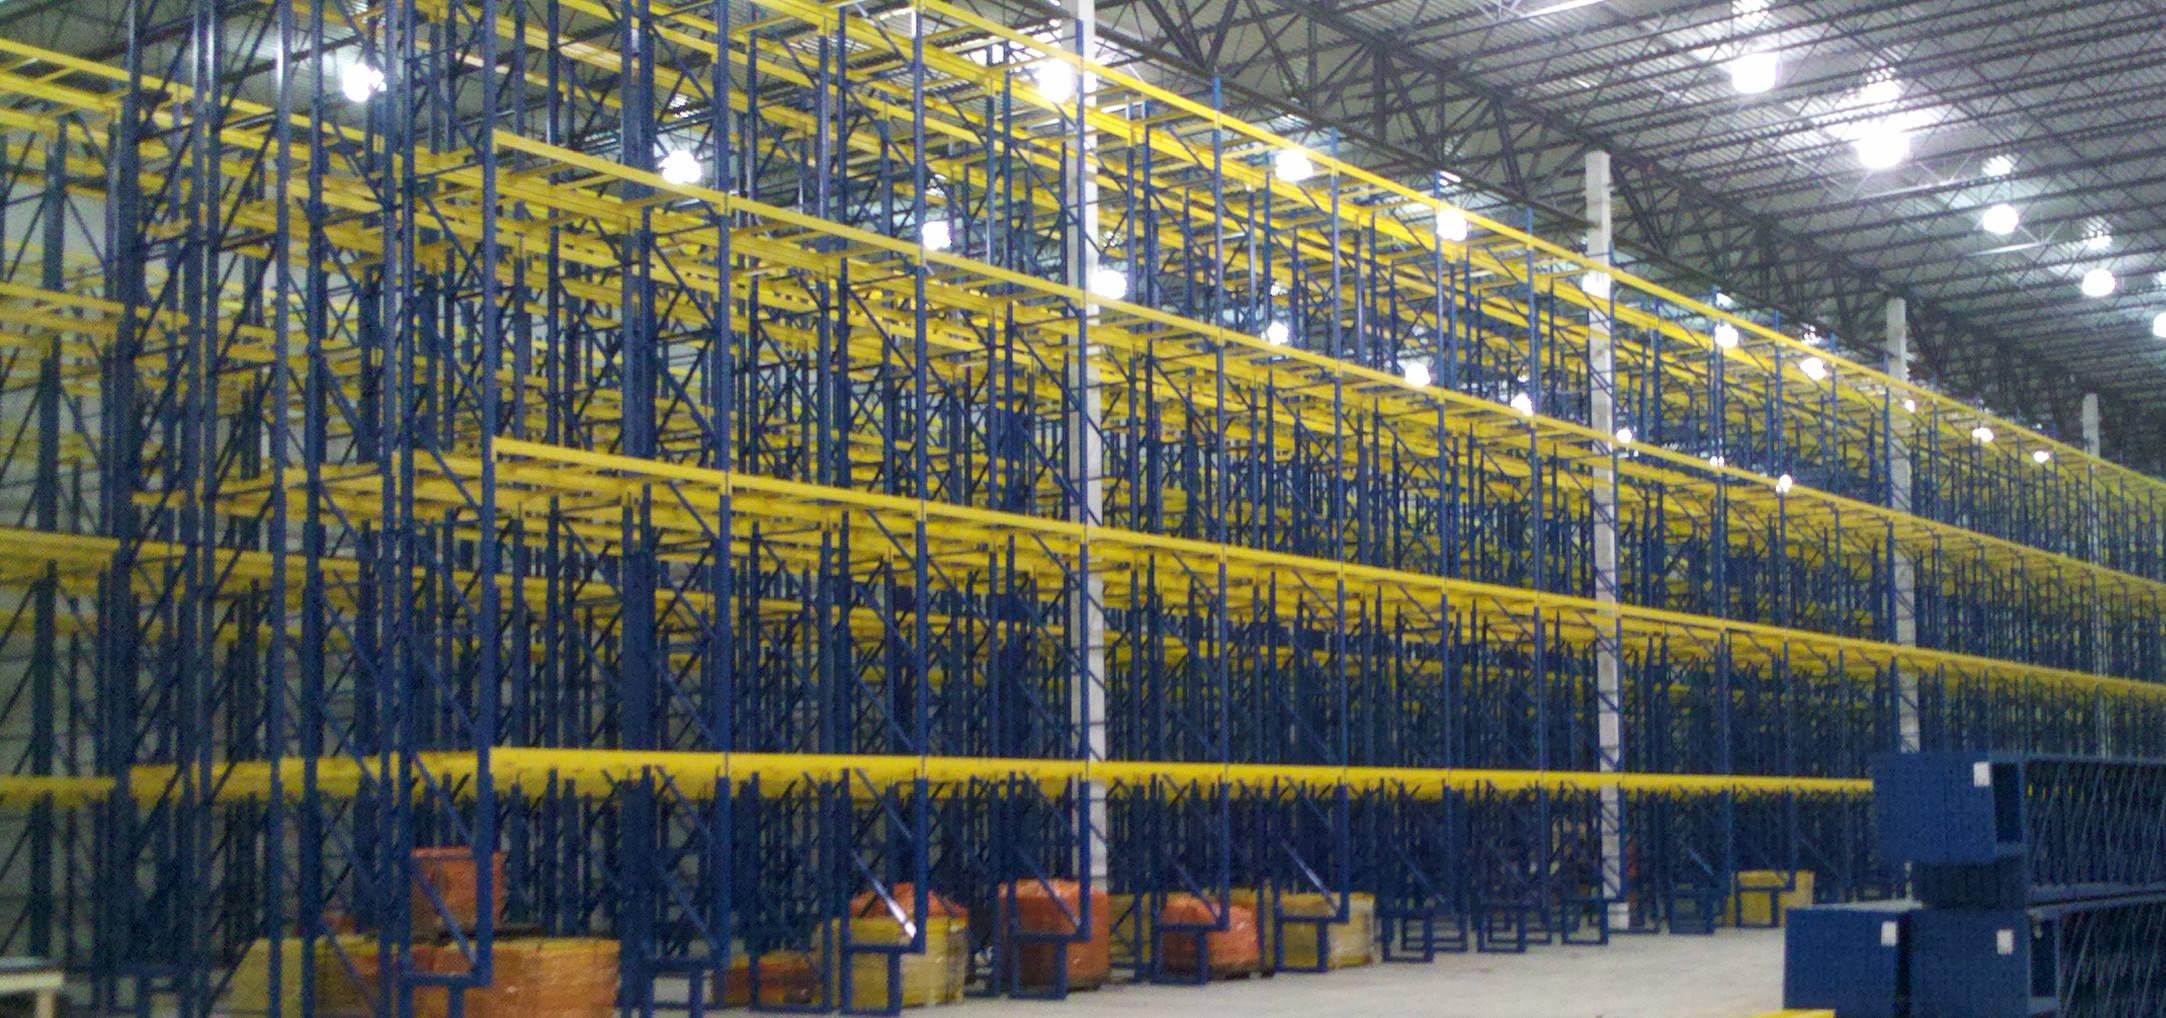 high pile storage raking company